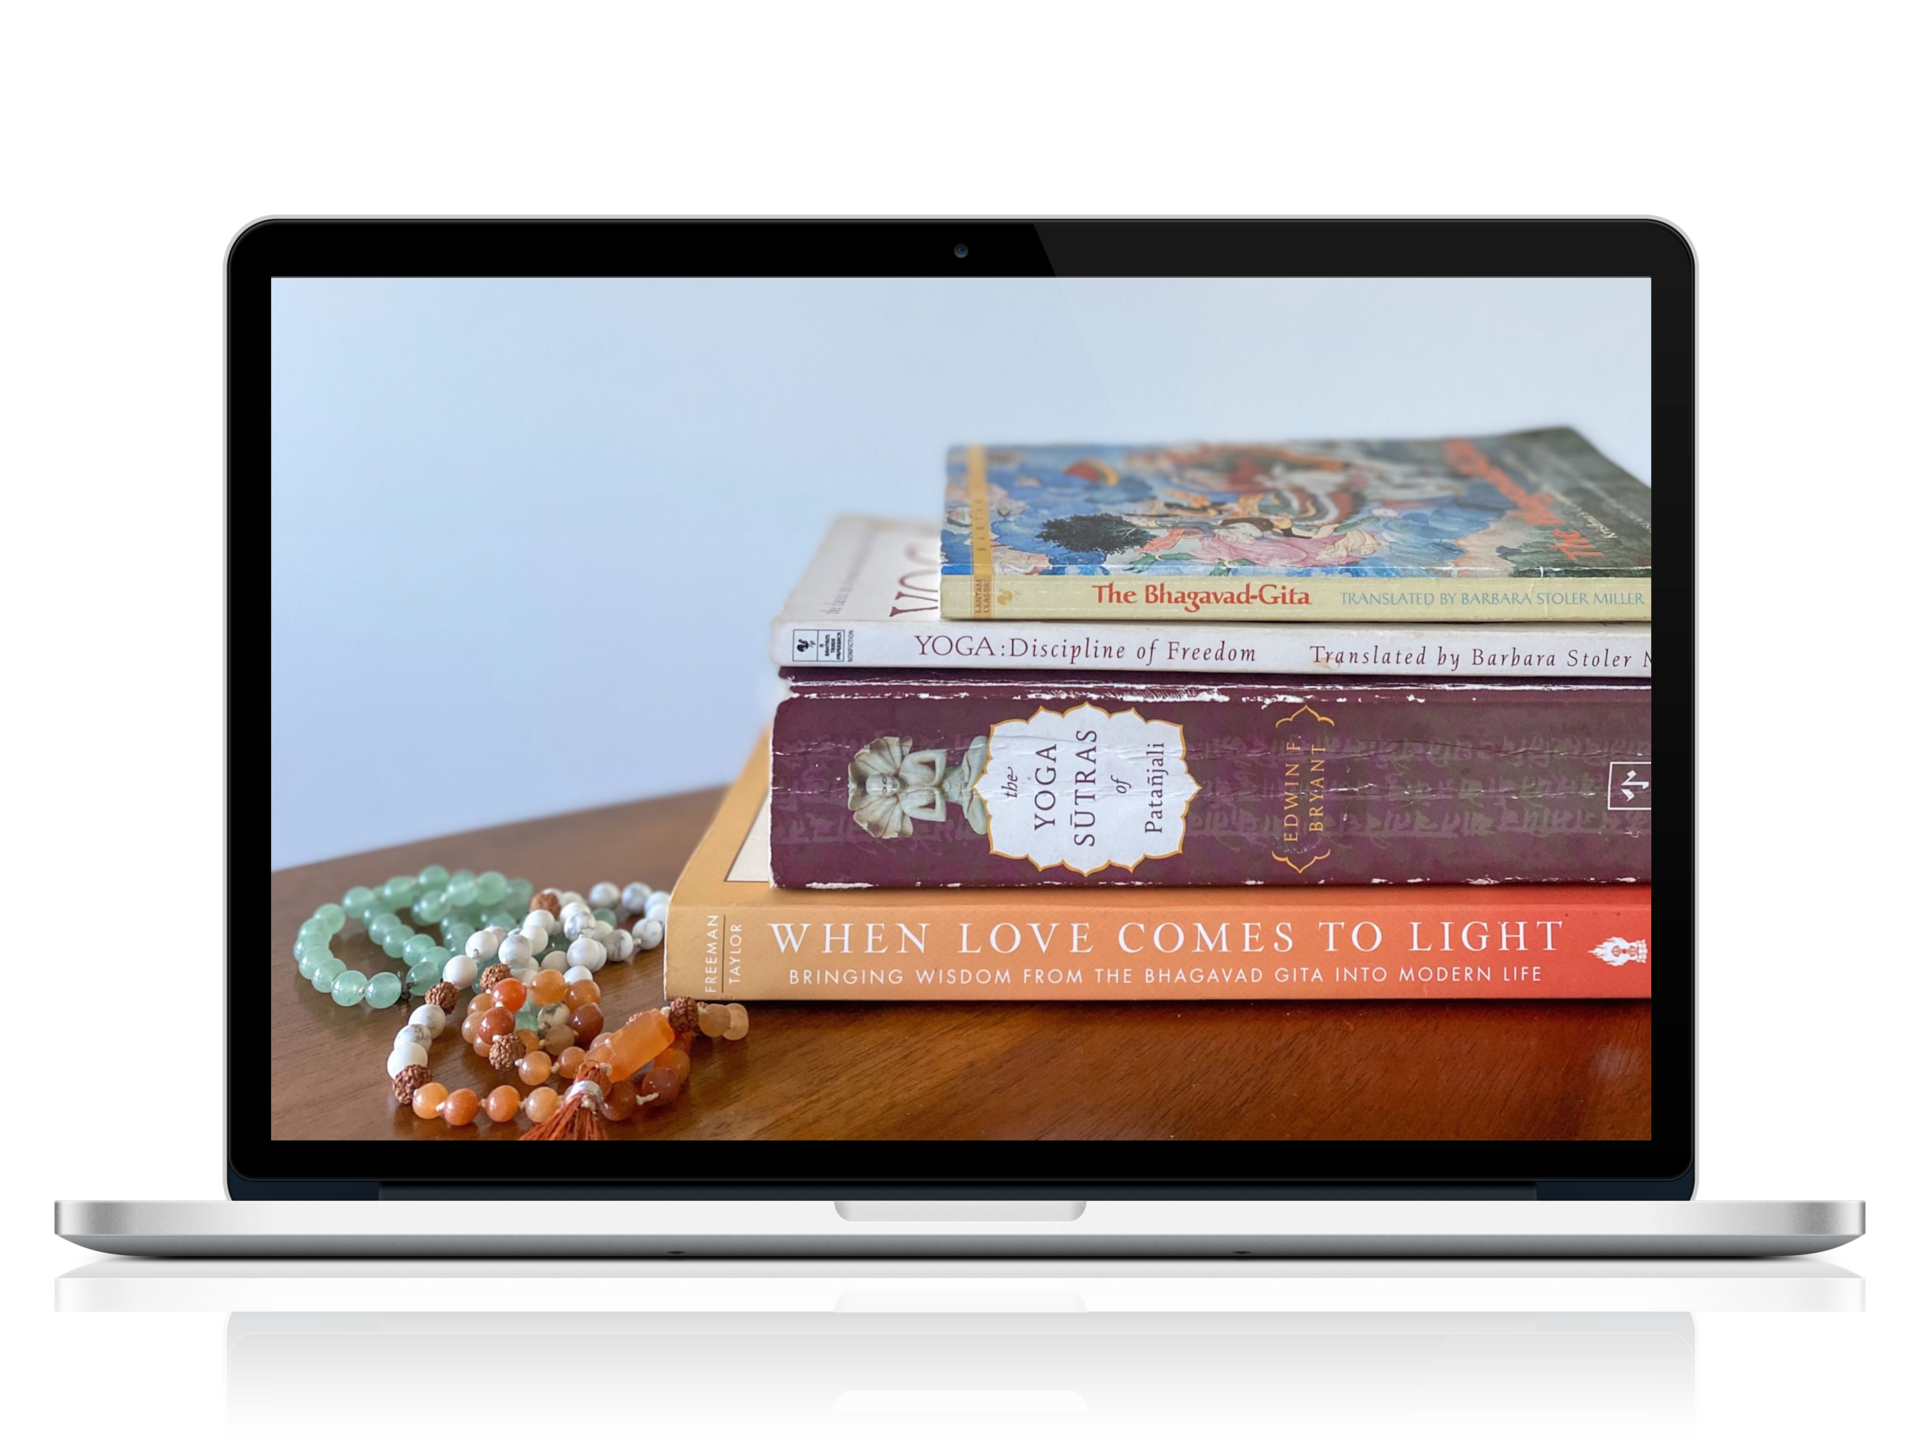 Ashtanga Central Meditation & Yoga Philosophy